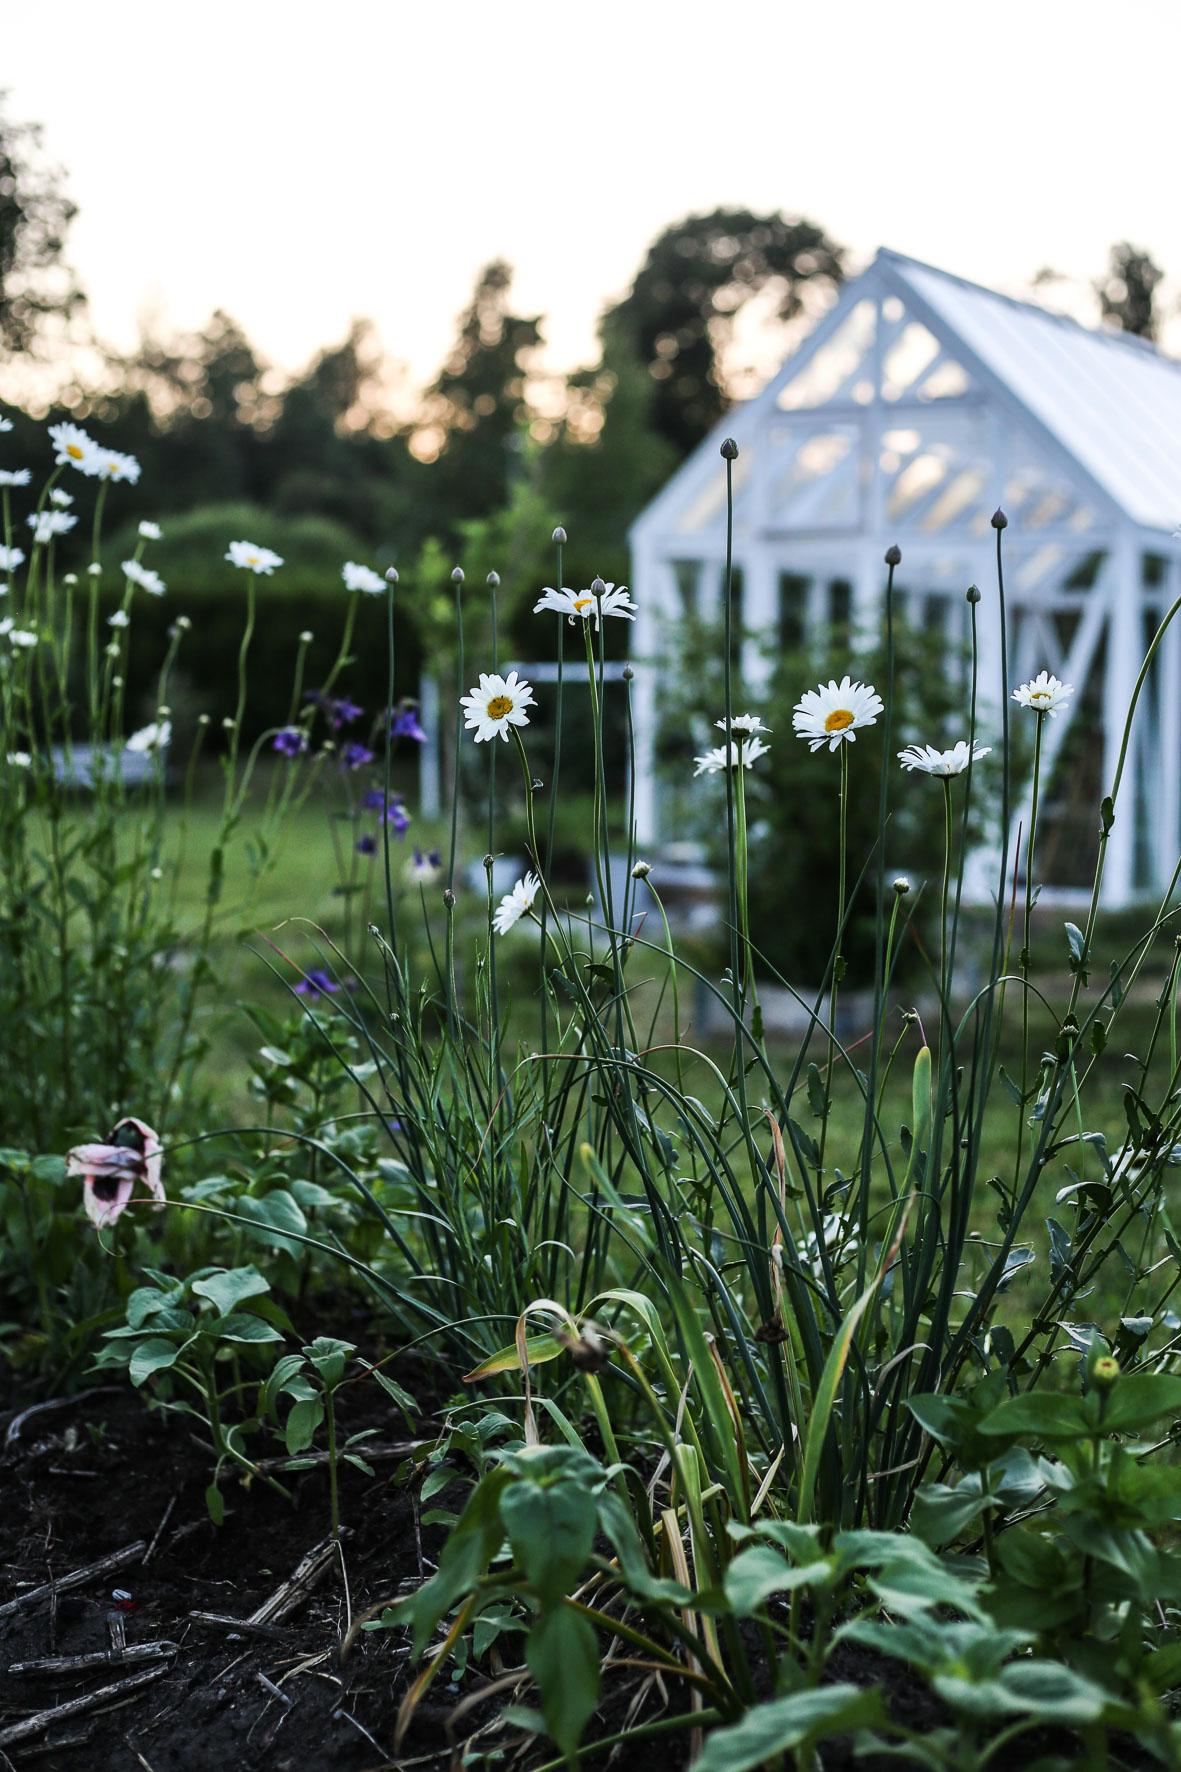 HannaWendelbo_Trädgård-Växthus.jpg